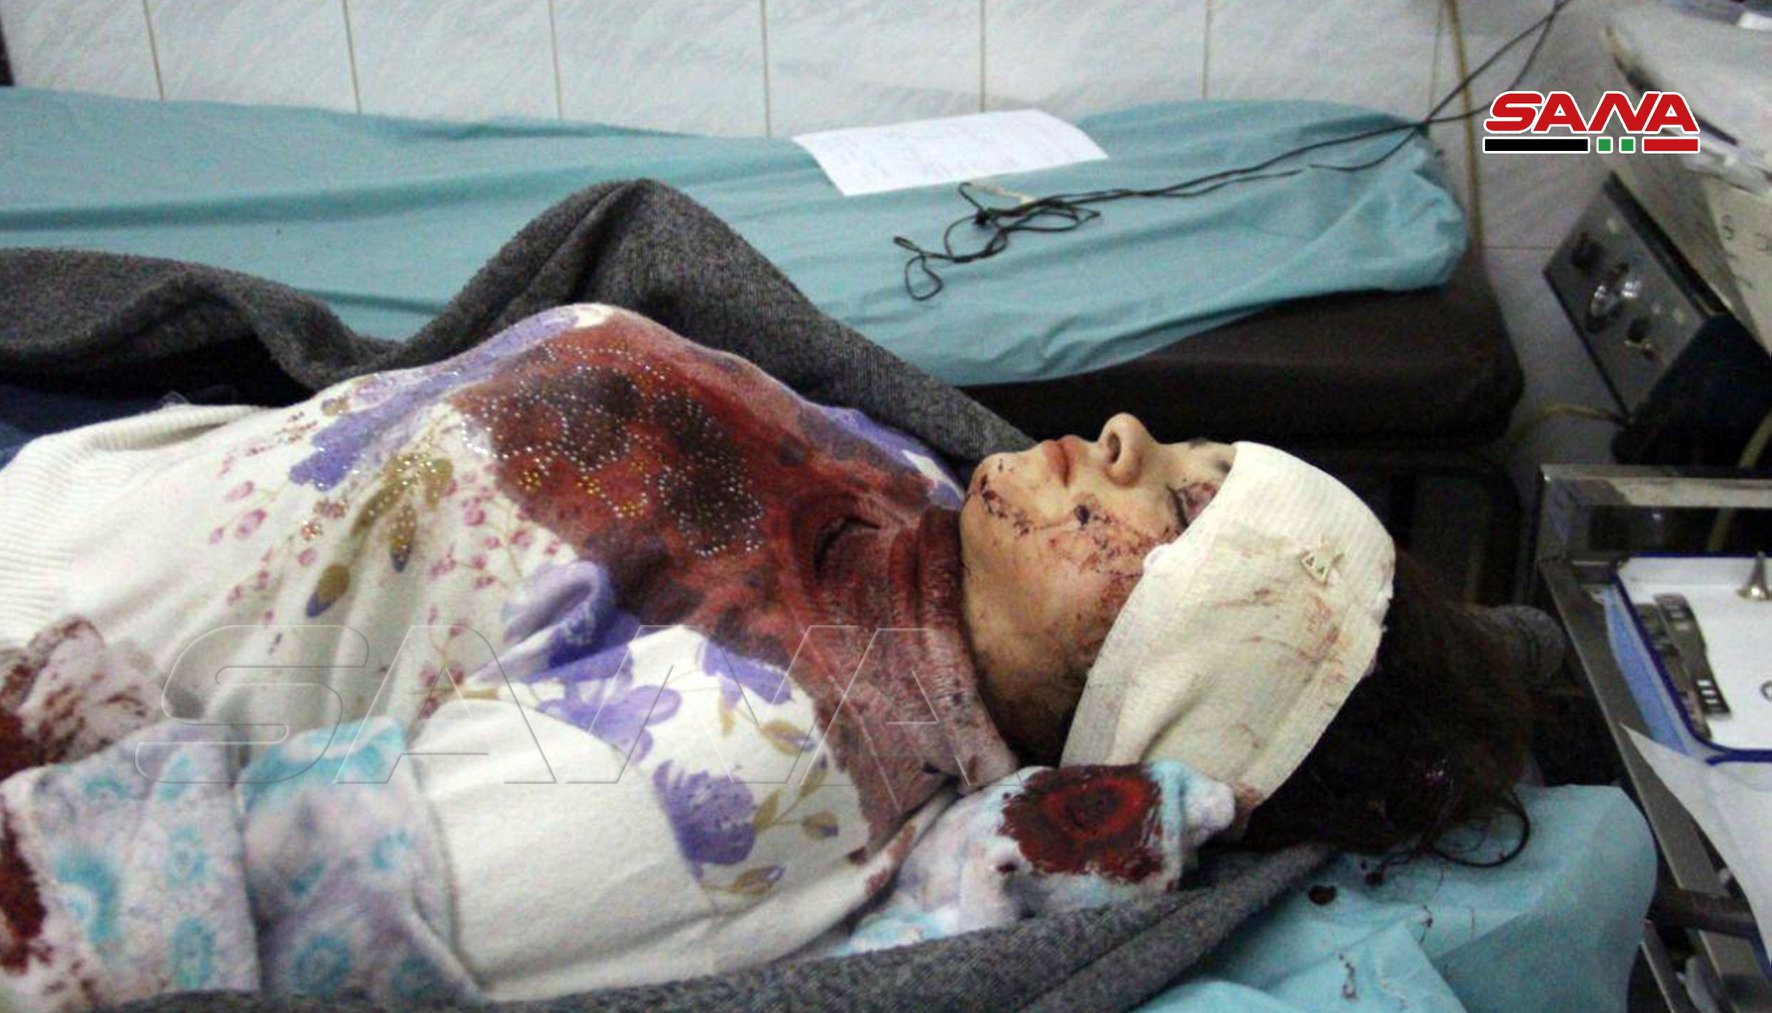 New Rocket Attack Injures Several Civilians In Aleppo City (Photos)